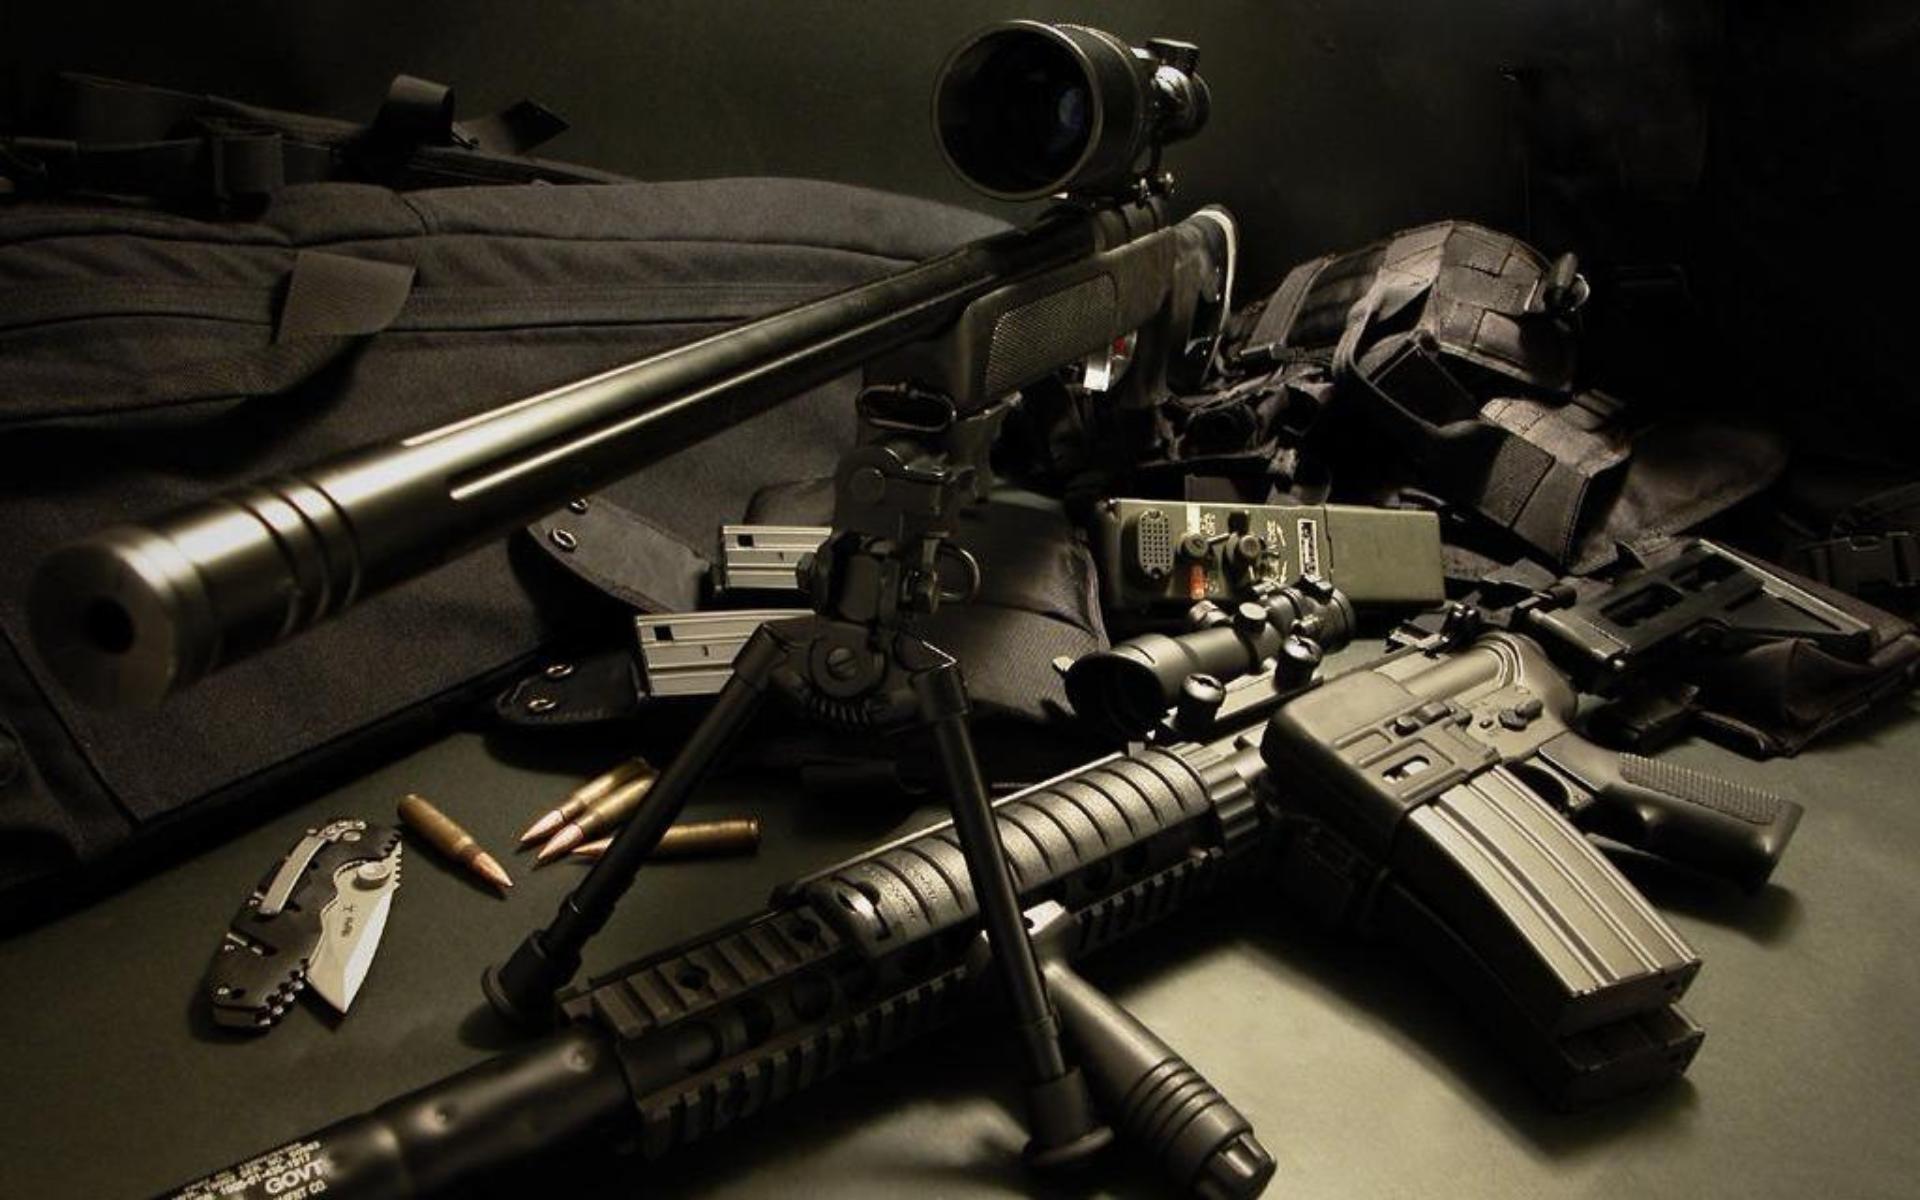 Sniper On Sunset Wallpaper HD Wallpaper WallpaperLepi 1920x1200